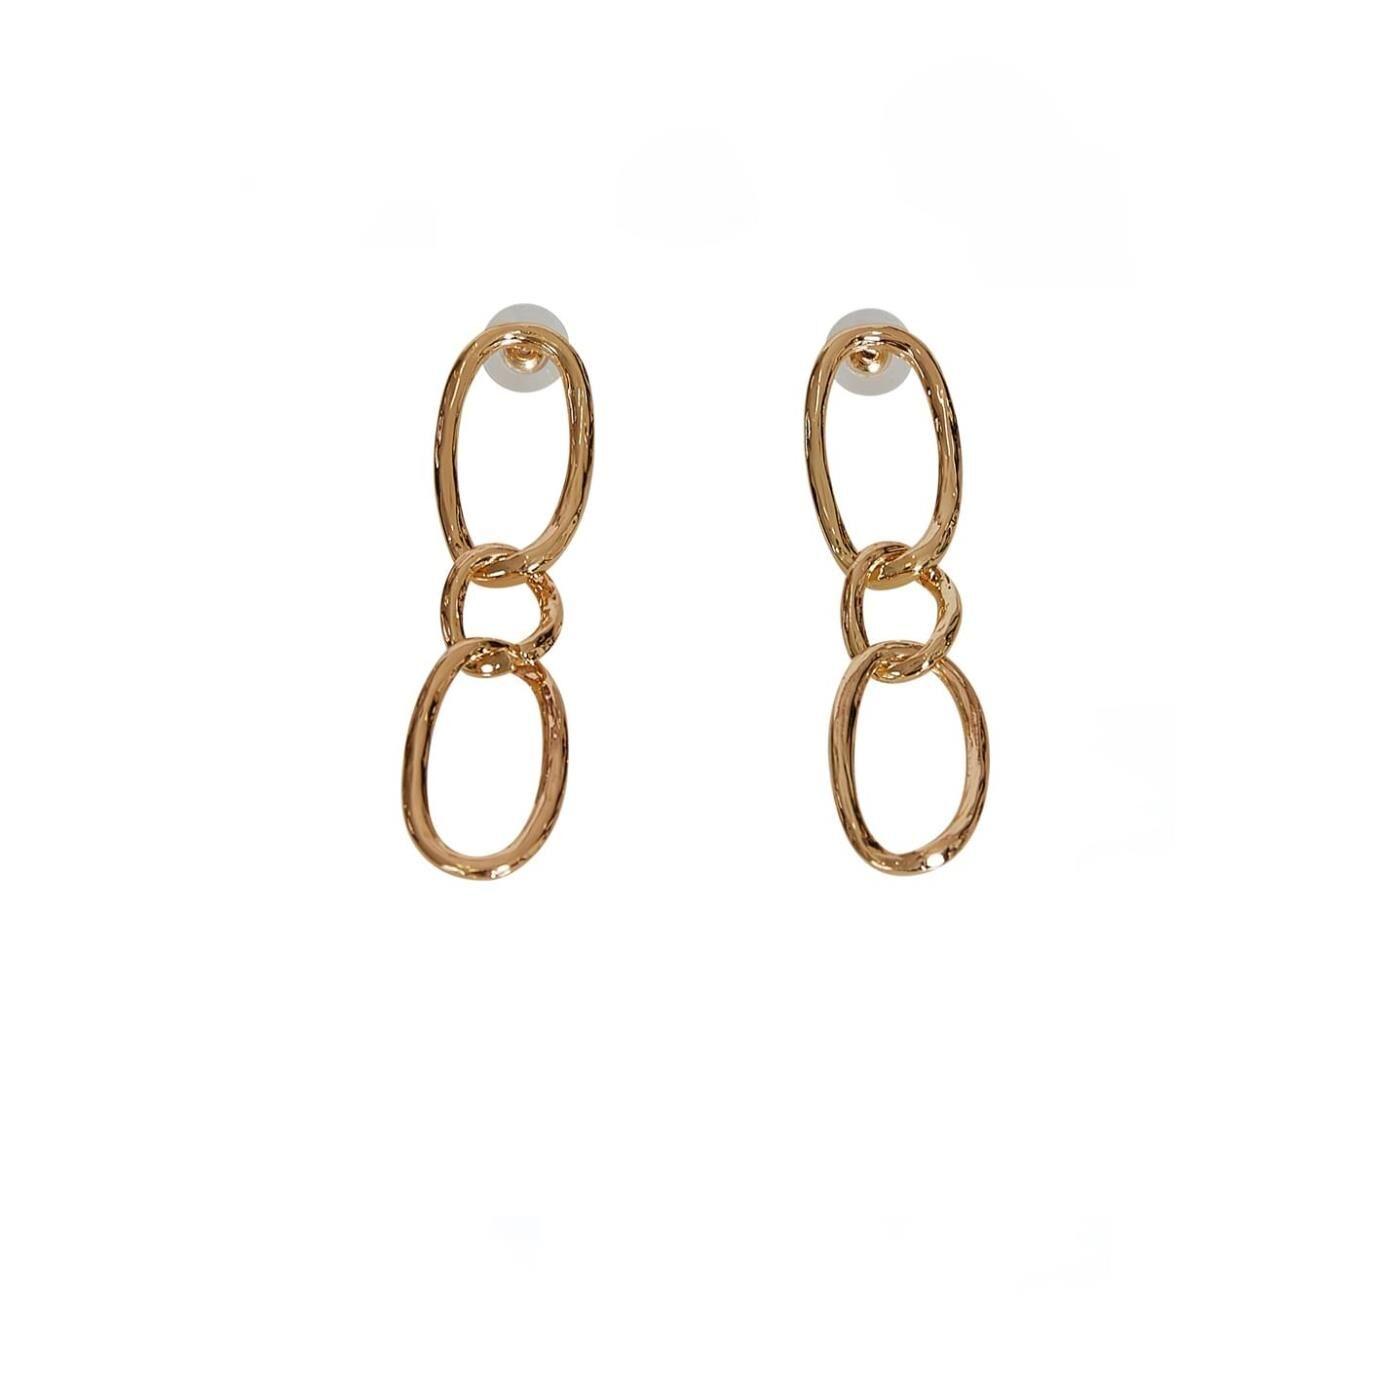 Celestino Κρεμαστά σκουλαρίκια  - Χρυσαφι - Grootte: One Size